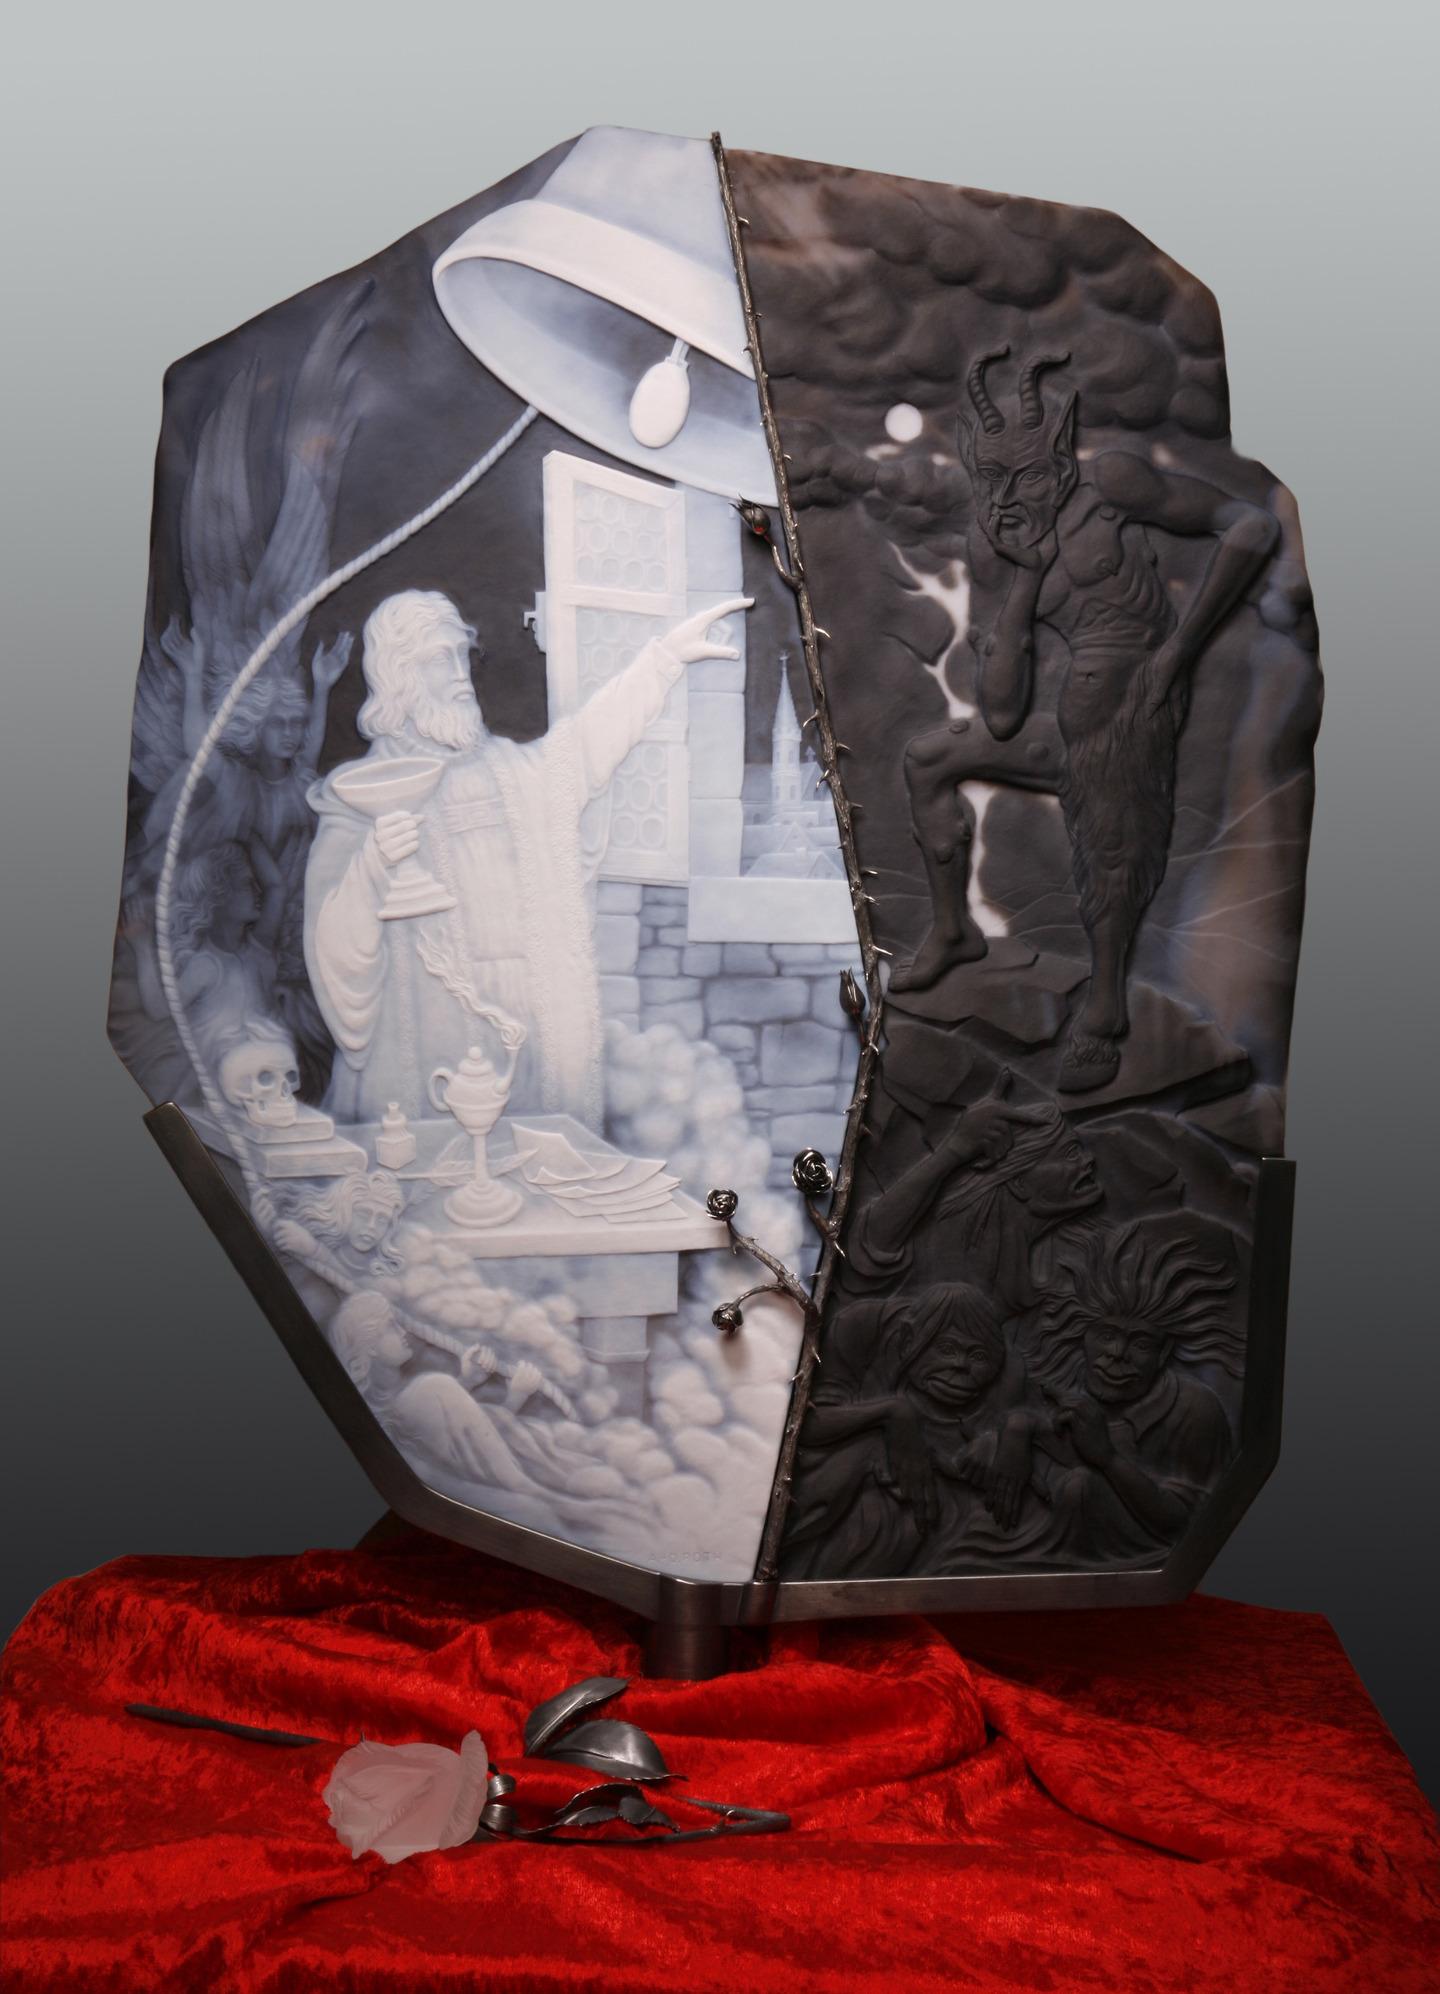 Faust in Edelstein - Die größten Kameen der Welt präsentieren Goethes Faust